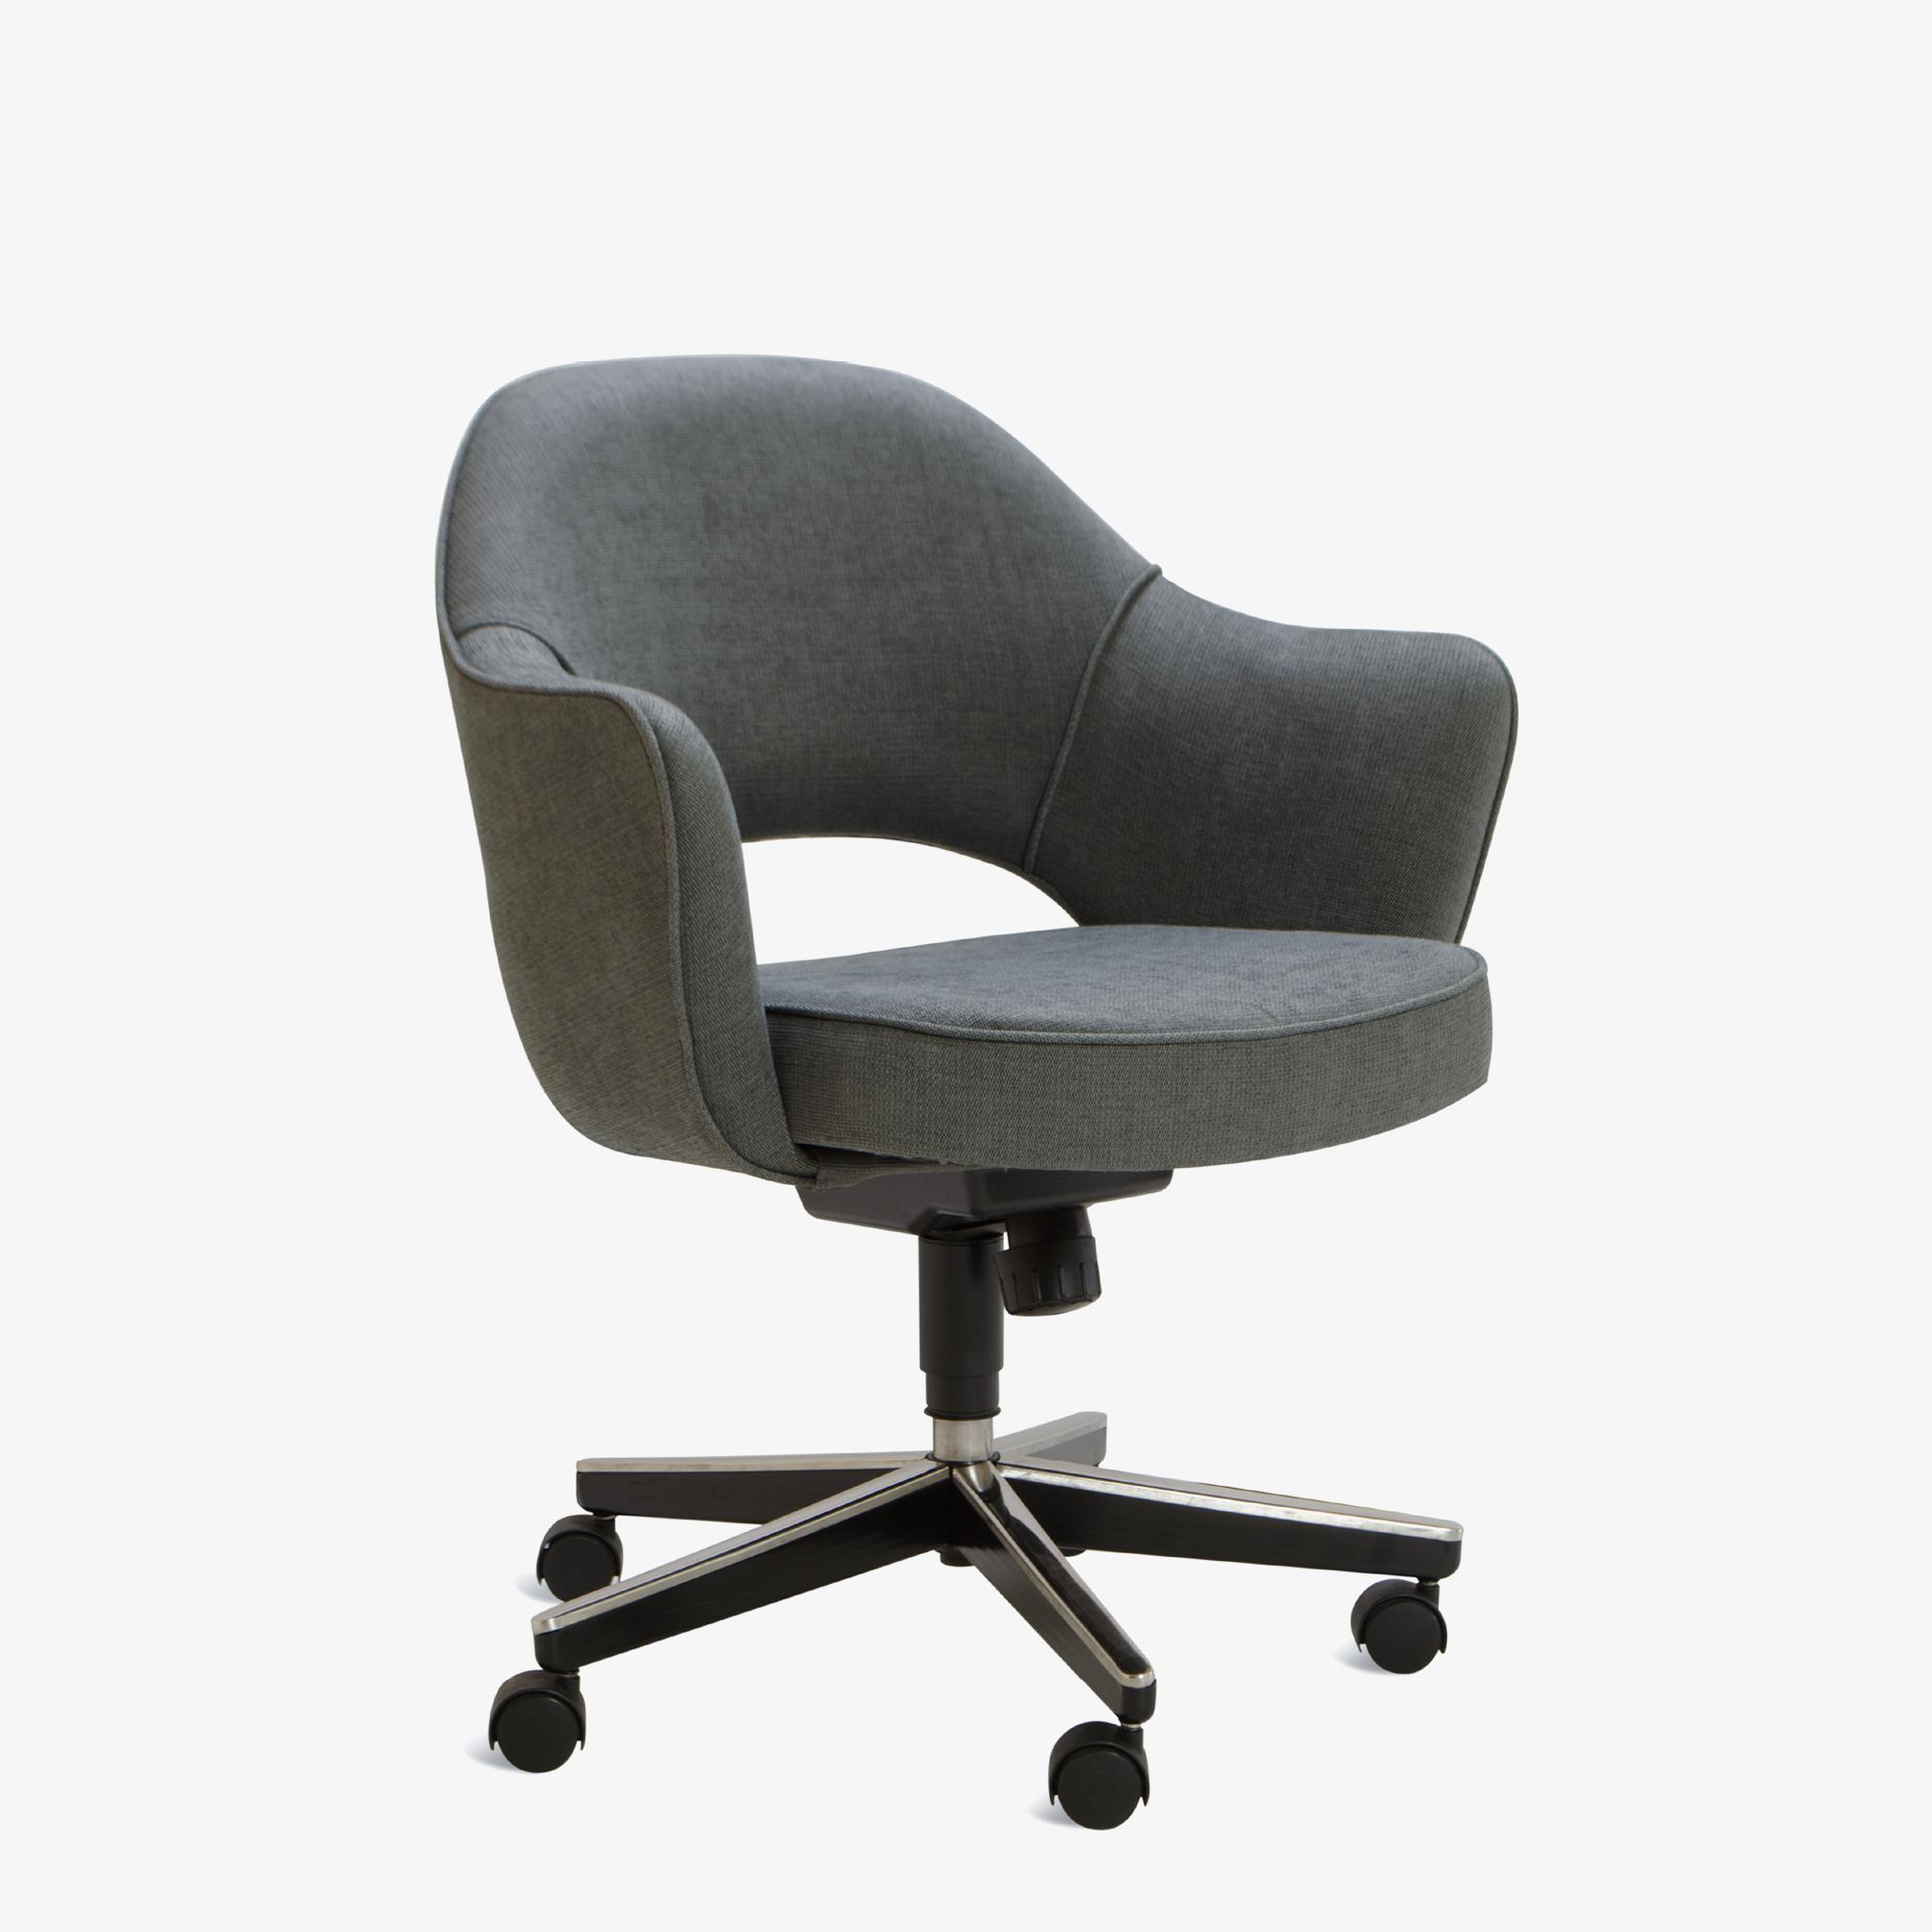 Knoll Saarinen Executive Arm Chair in Fabric, Swivel Base